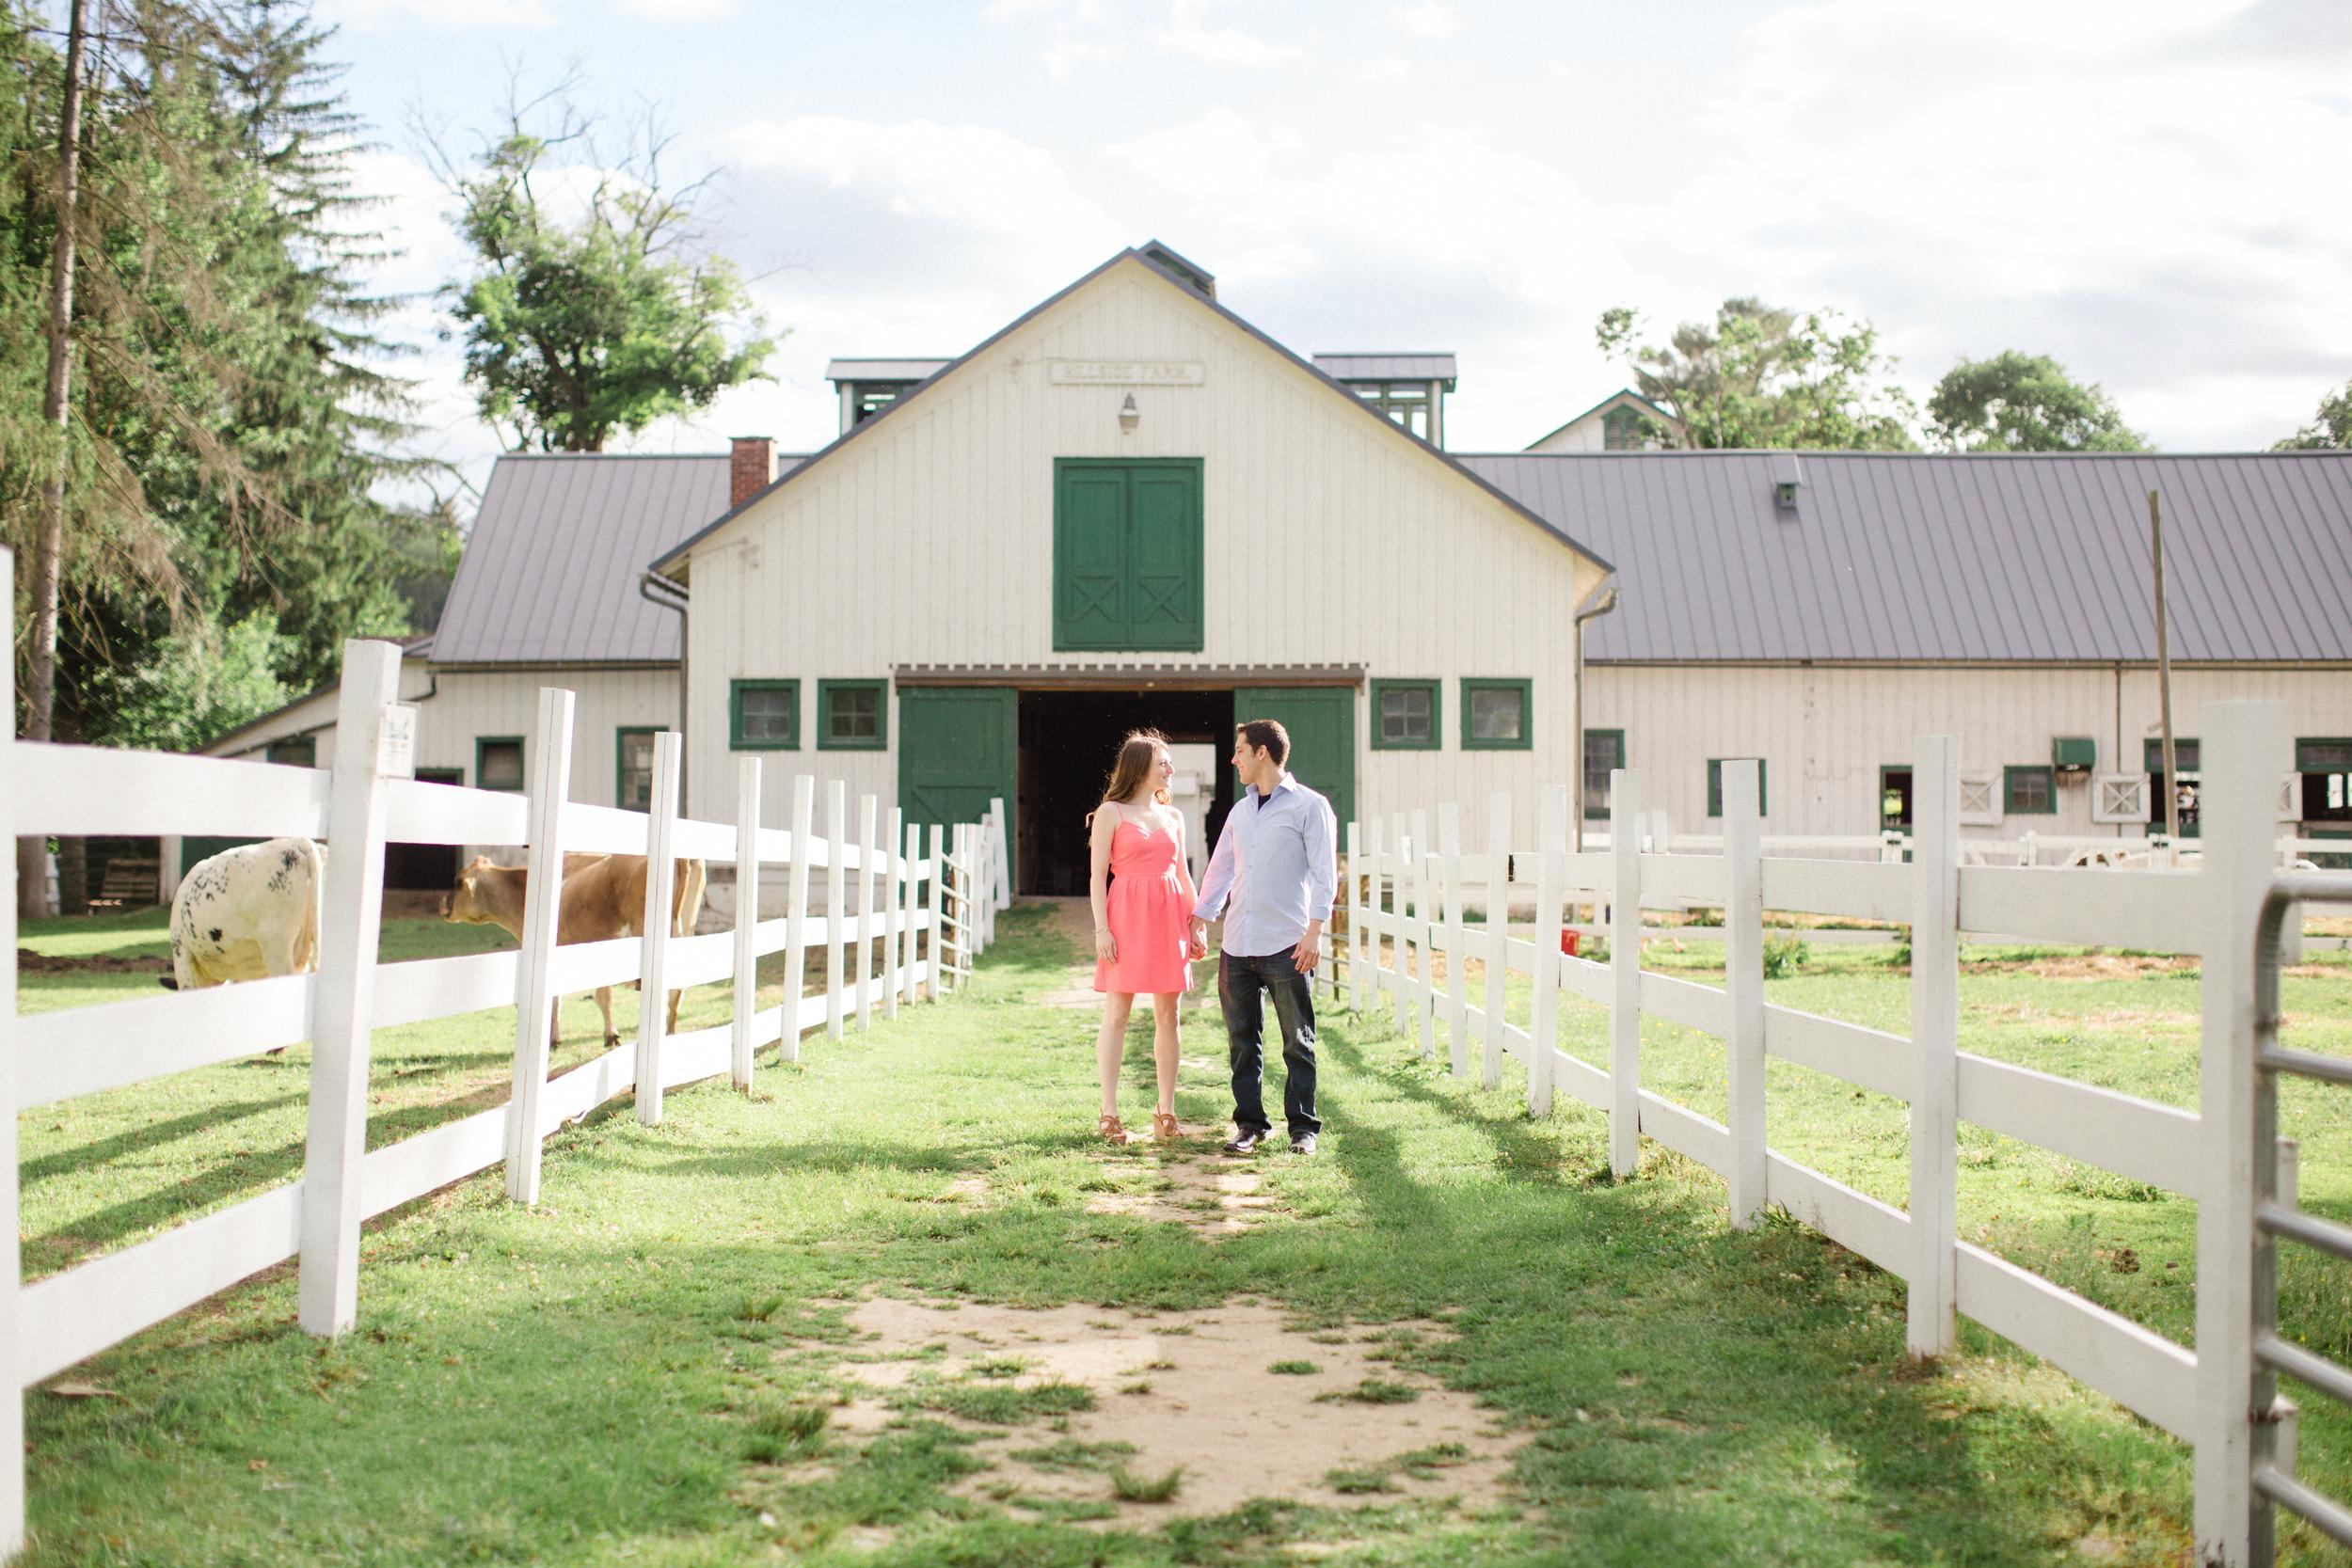 Michelle Anthony Hillside Farms Engagement Session Photos Jordan Denike Photography